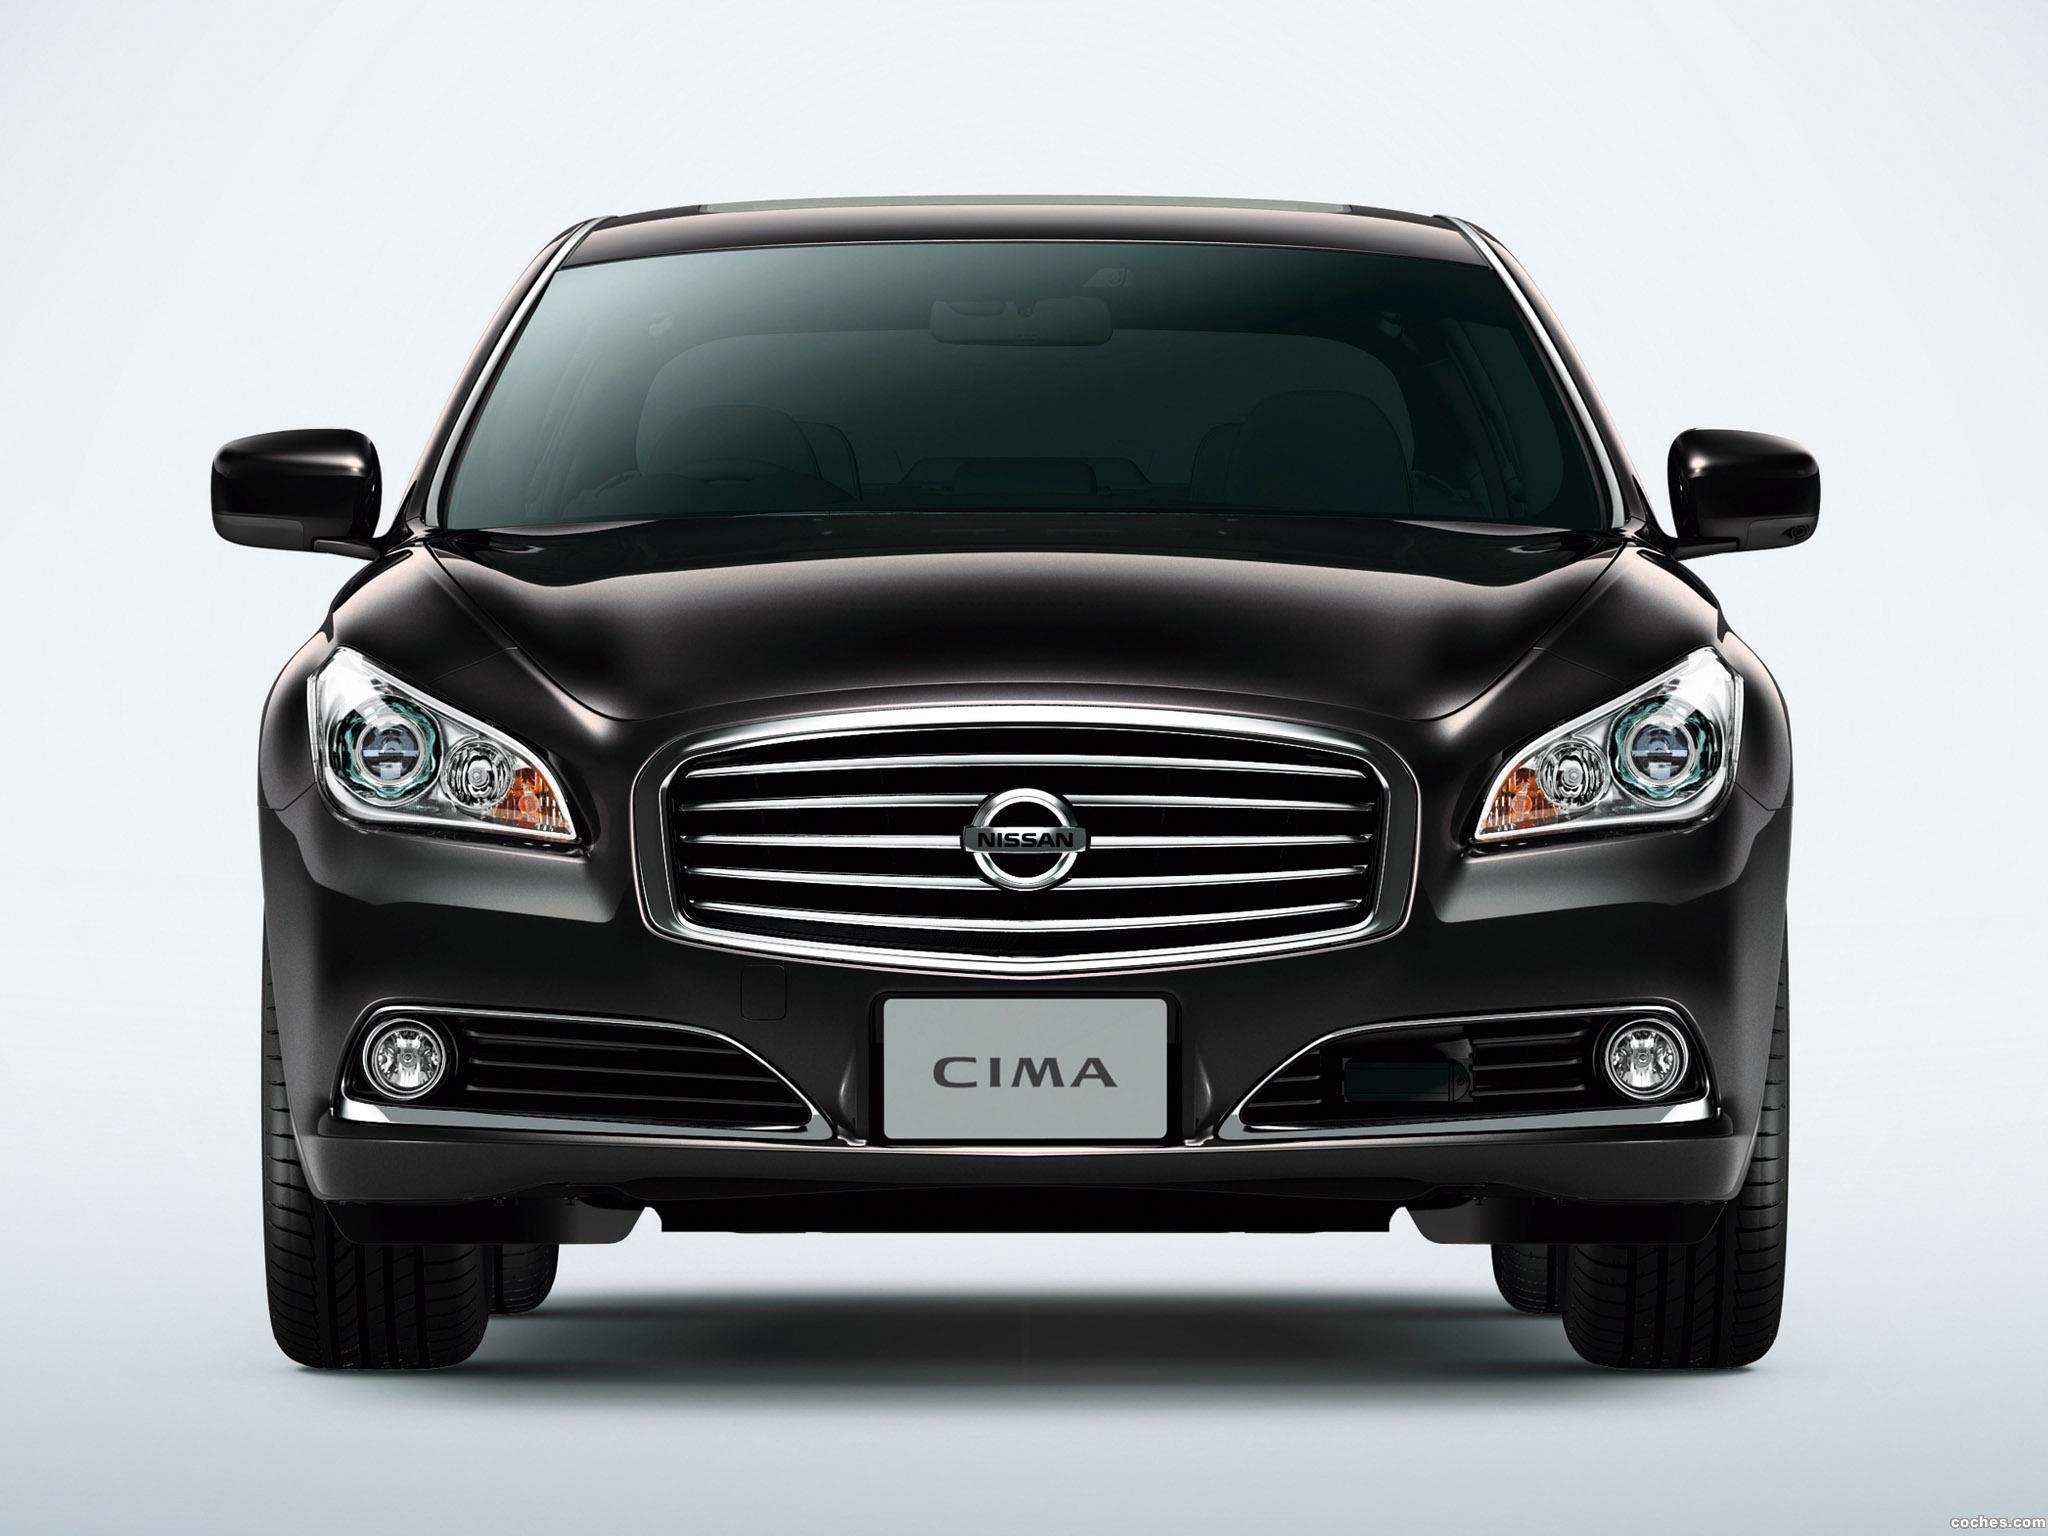 Foto 9 de Nissan Cima Hybrid HGY51 2012